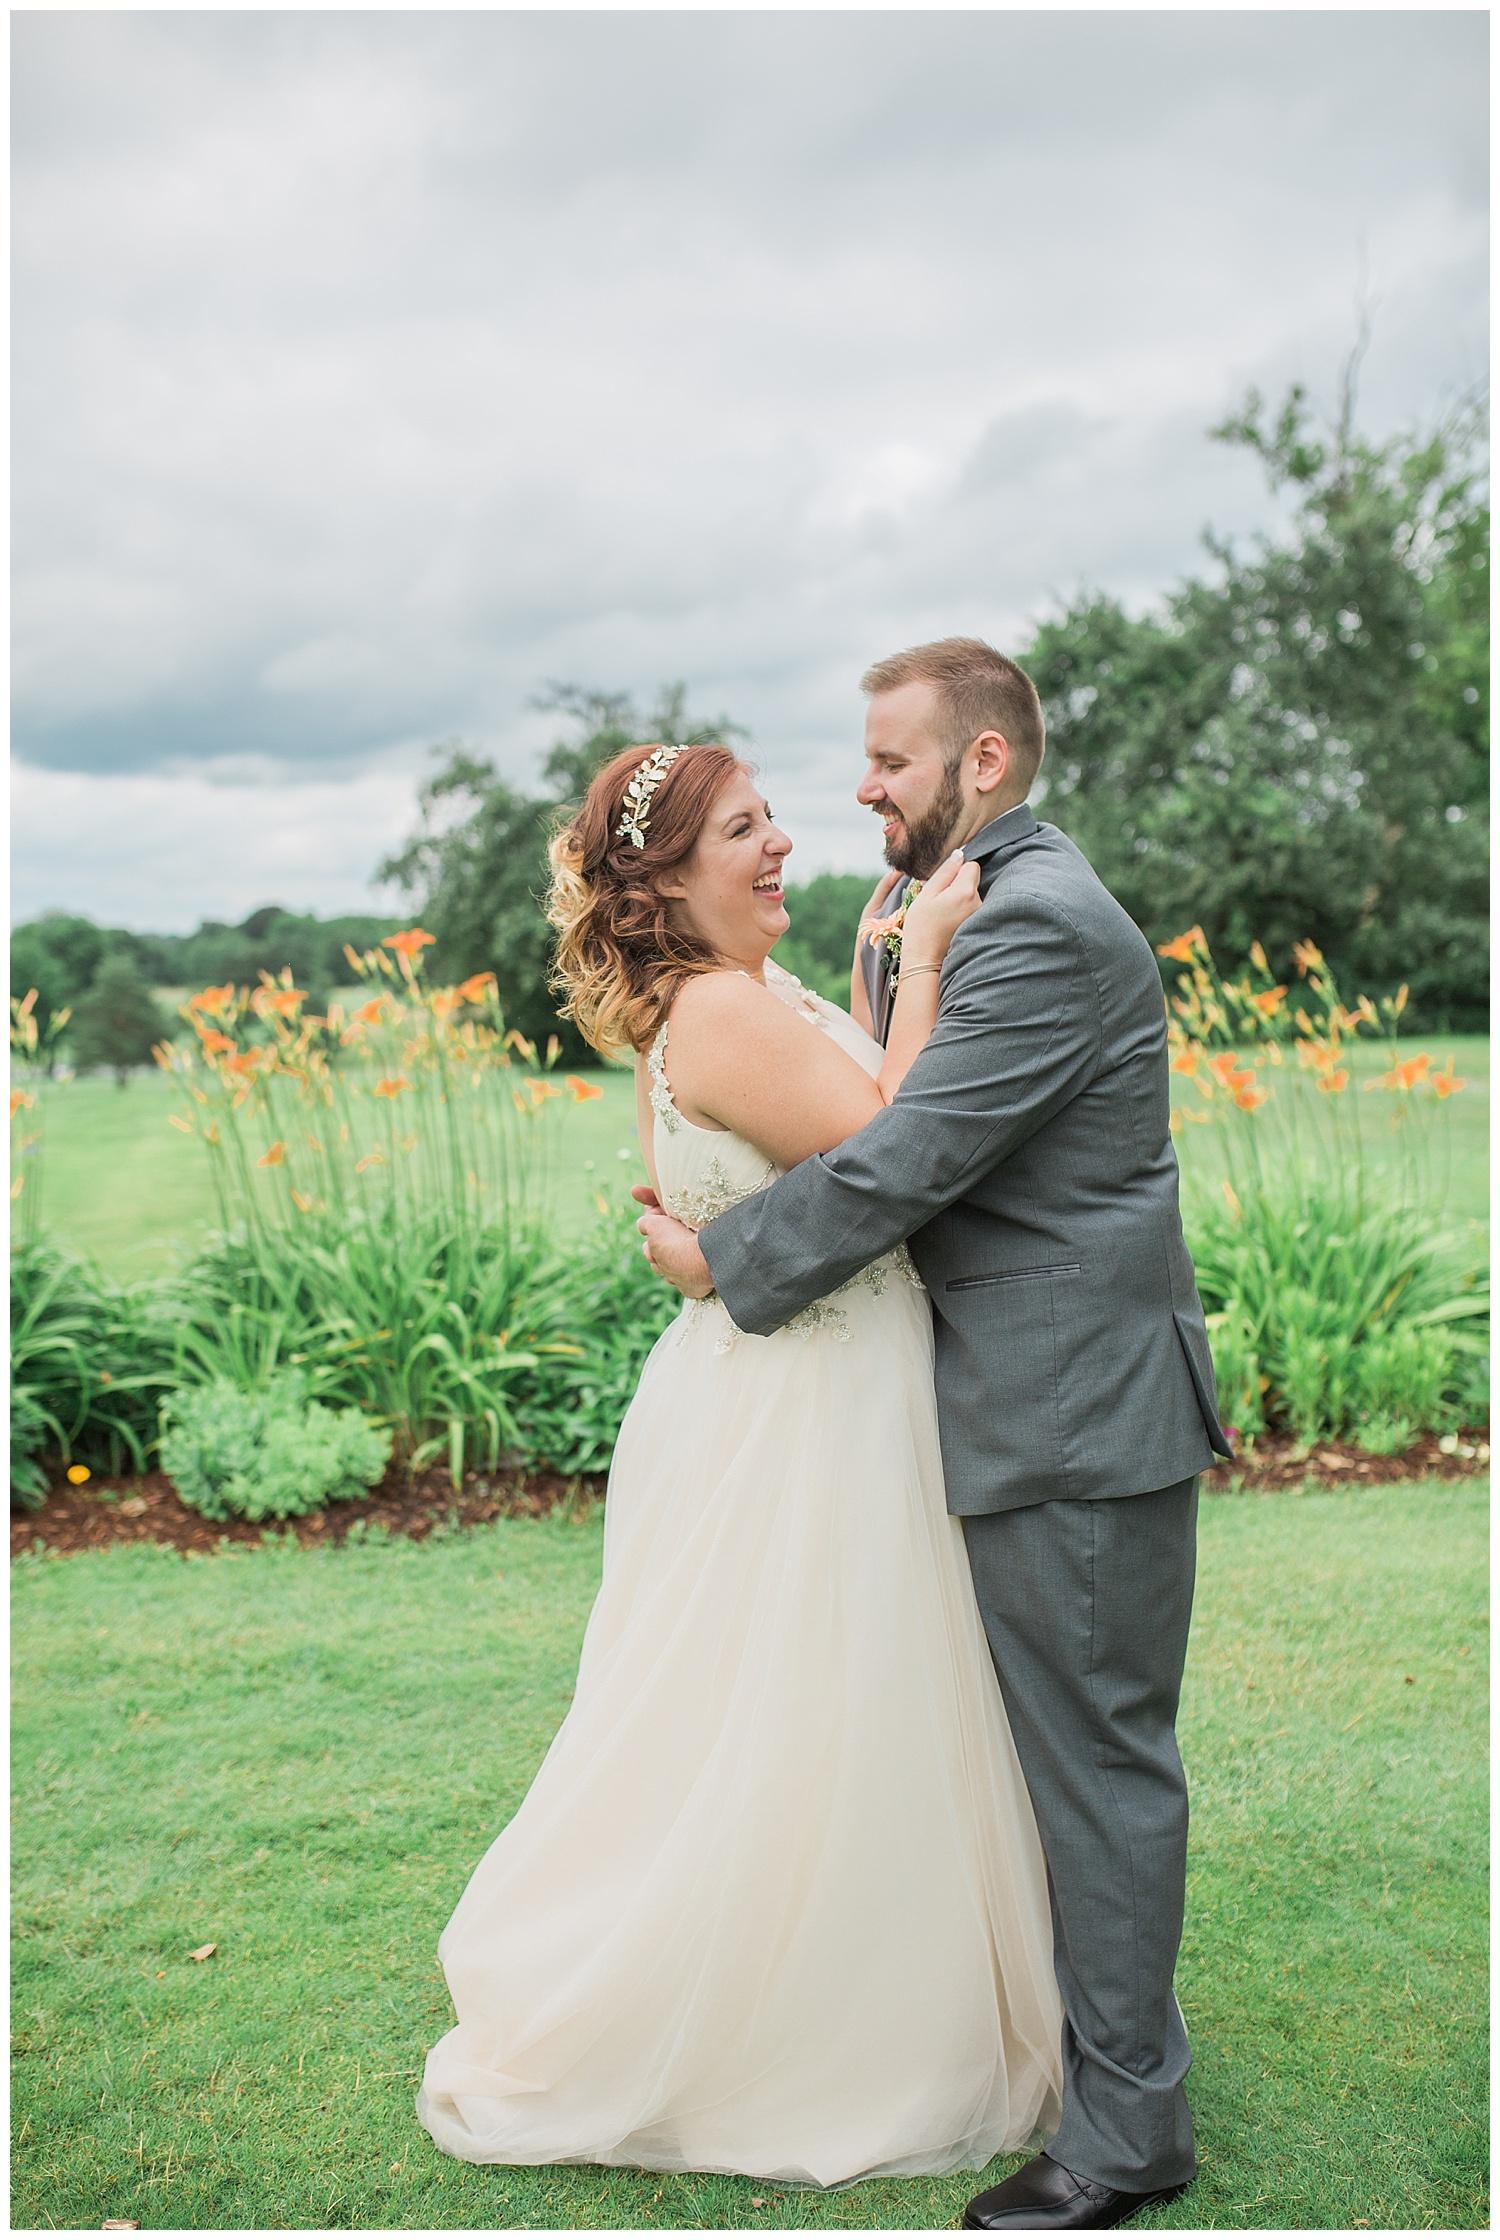 Brian and Molly Wed in Conesus NY - Lass & Beau-759_Buffalo wedding photography.jpg